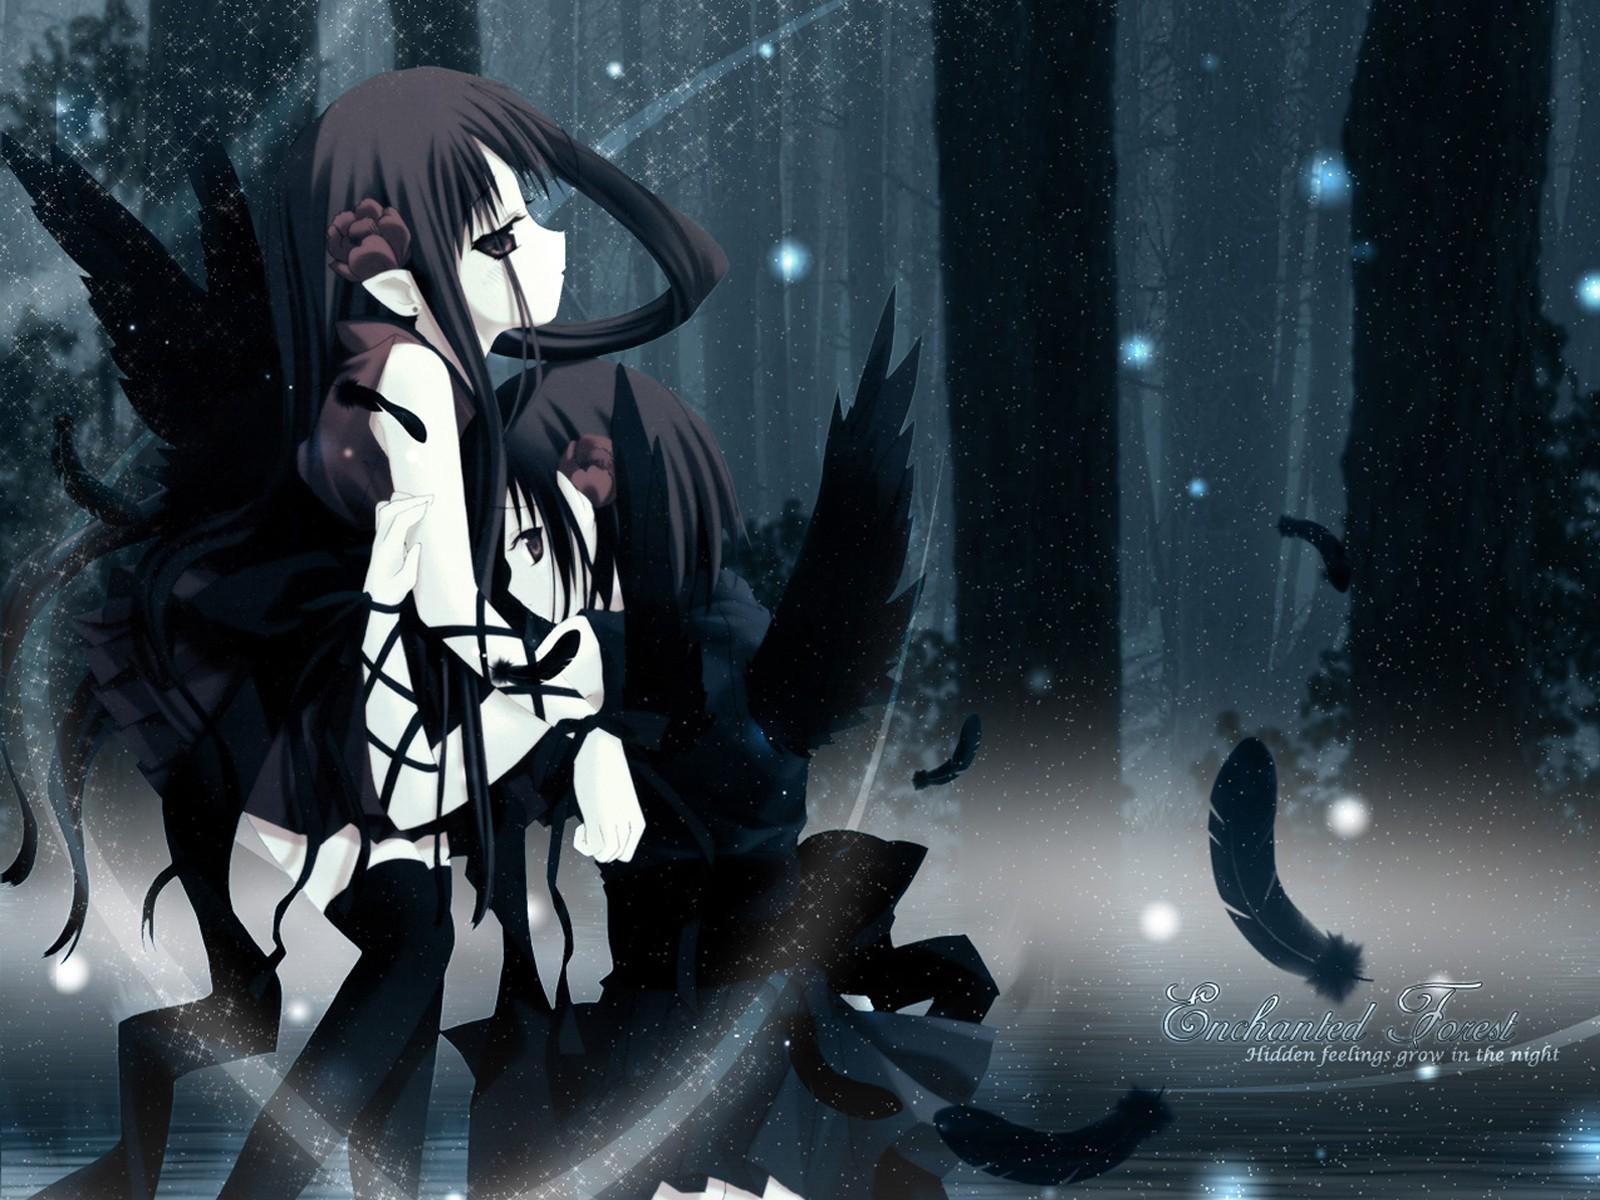 Angels women wood forests demons yuri devil anime manga anime